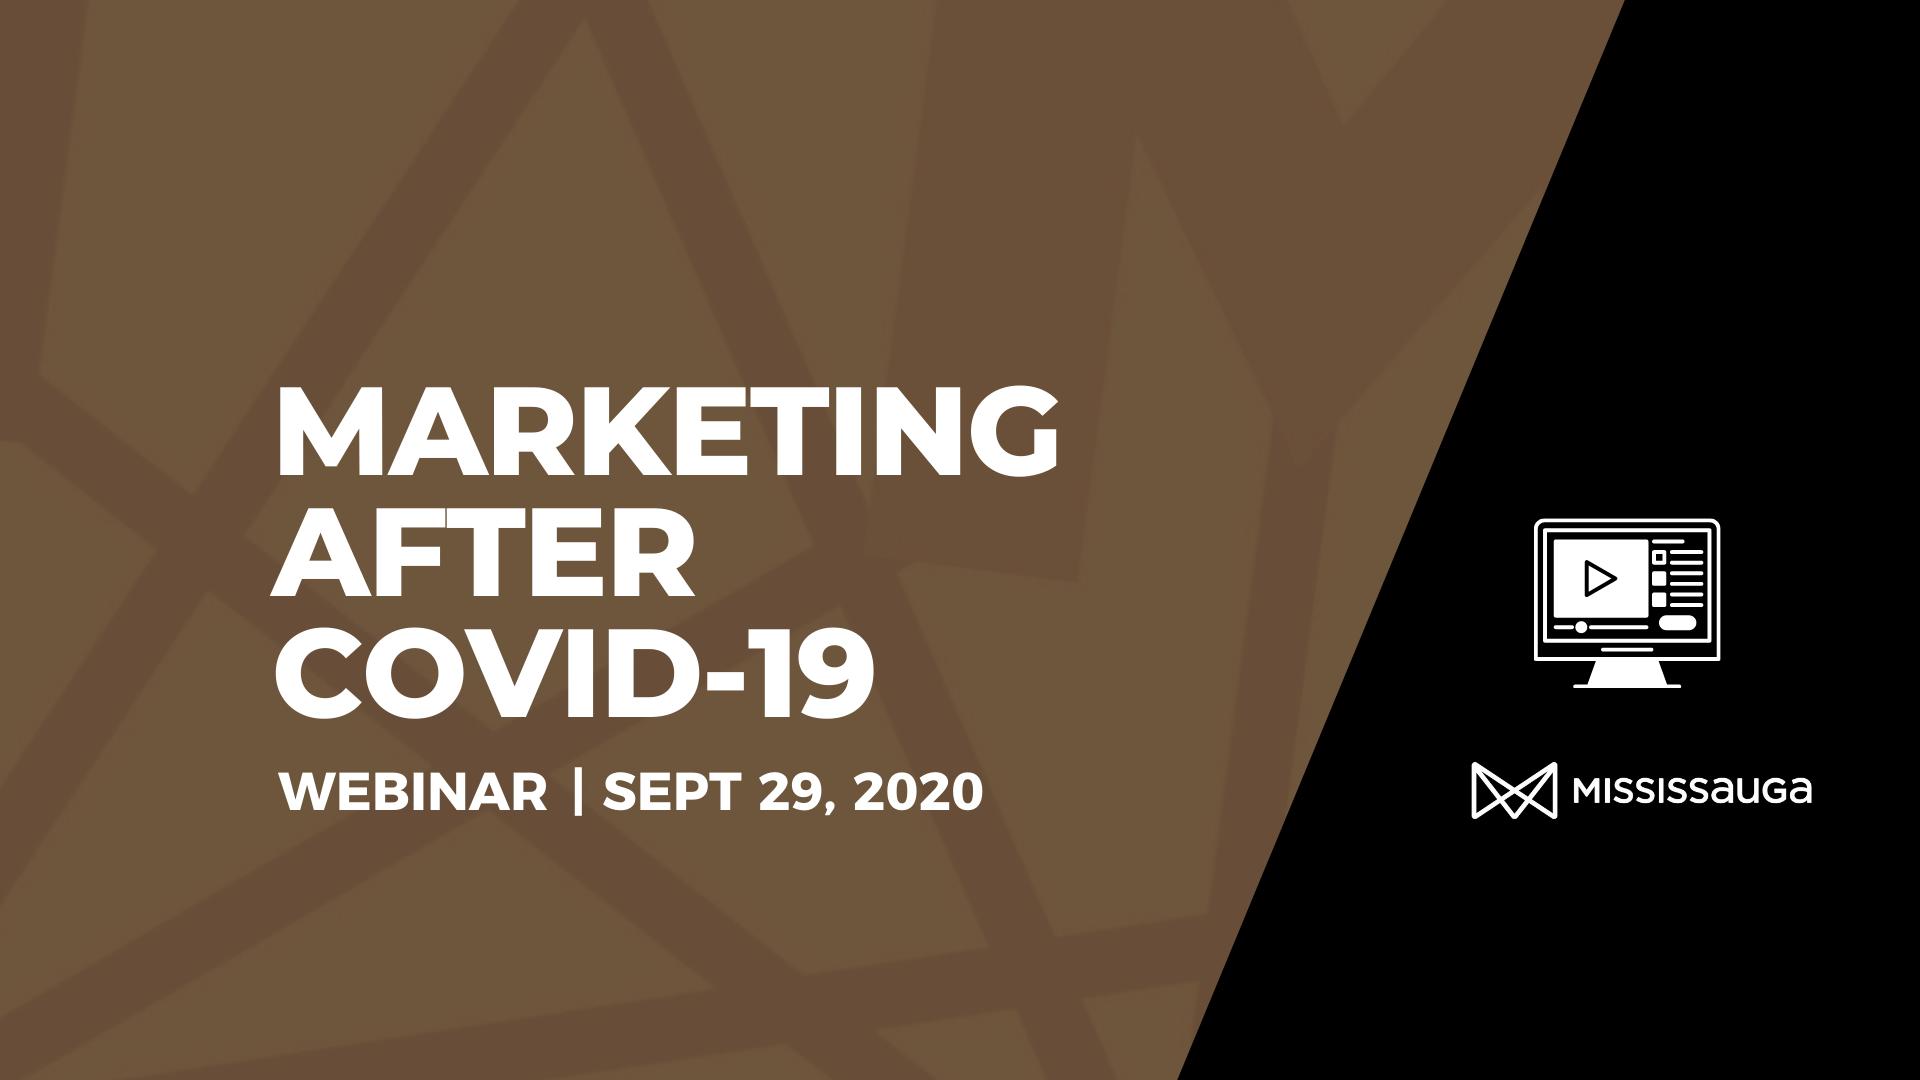 Marketing after COVD-19 – Webinar, Sept 29